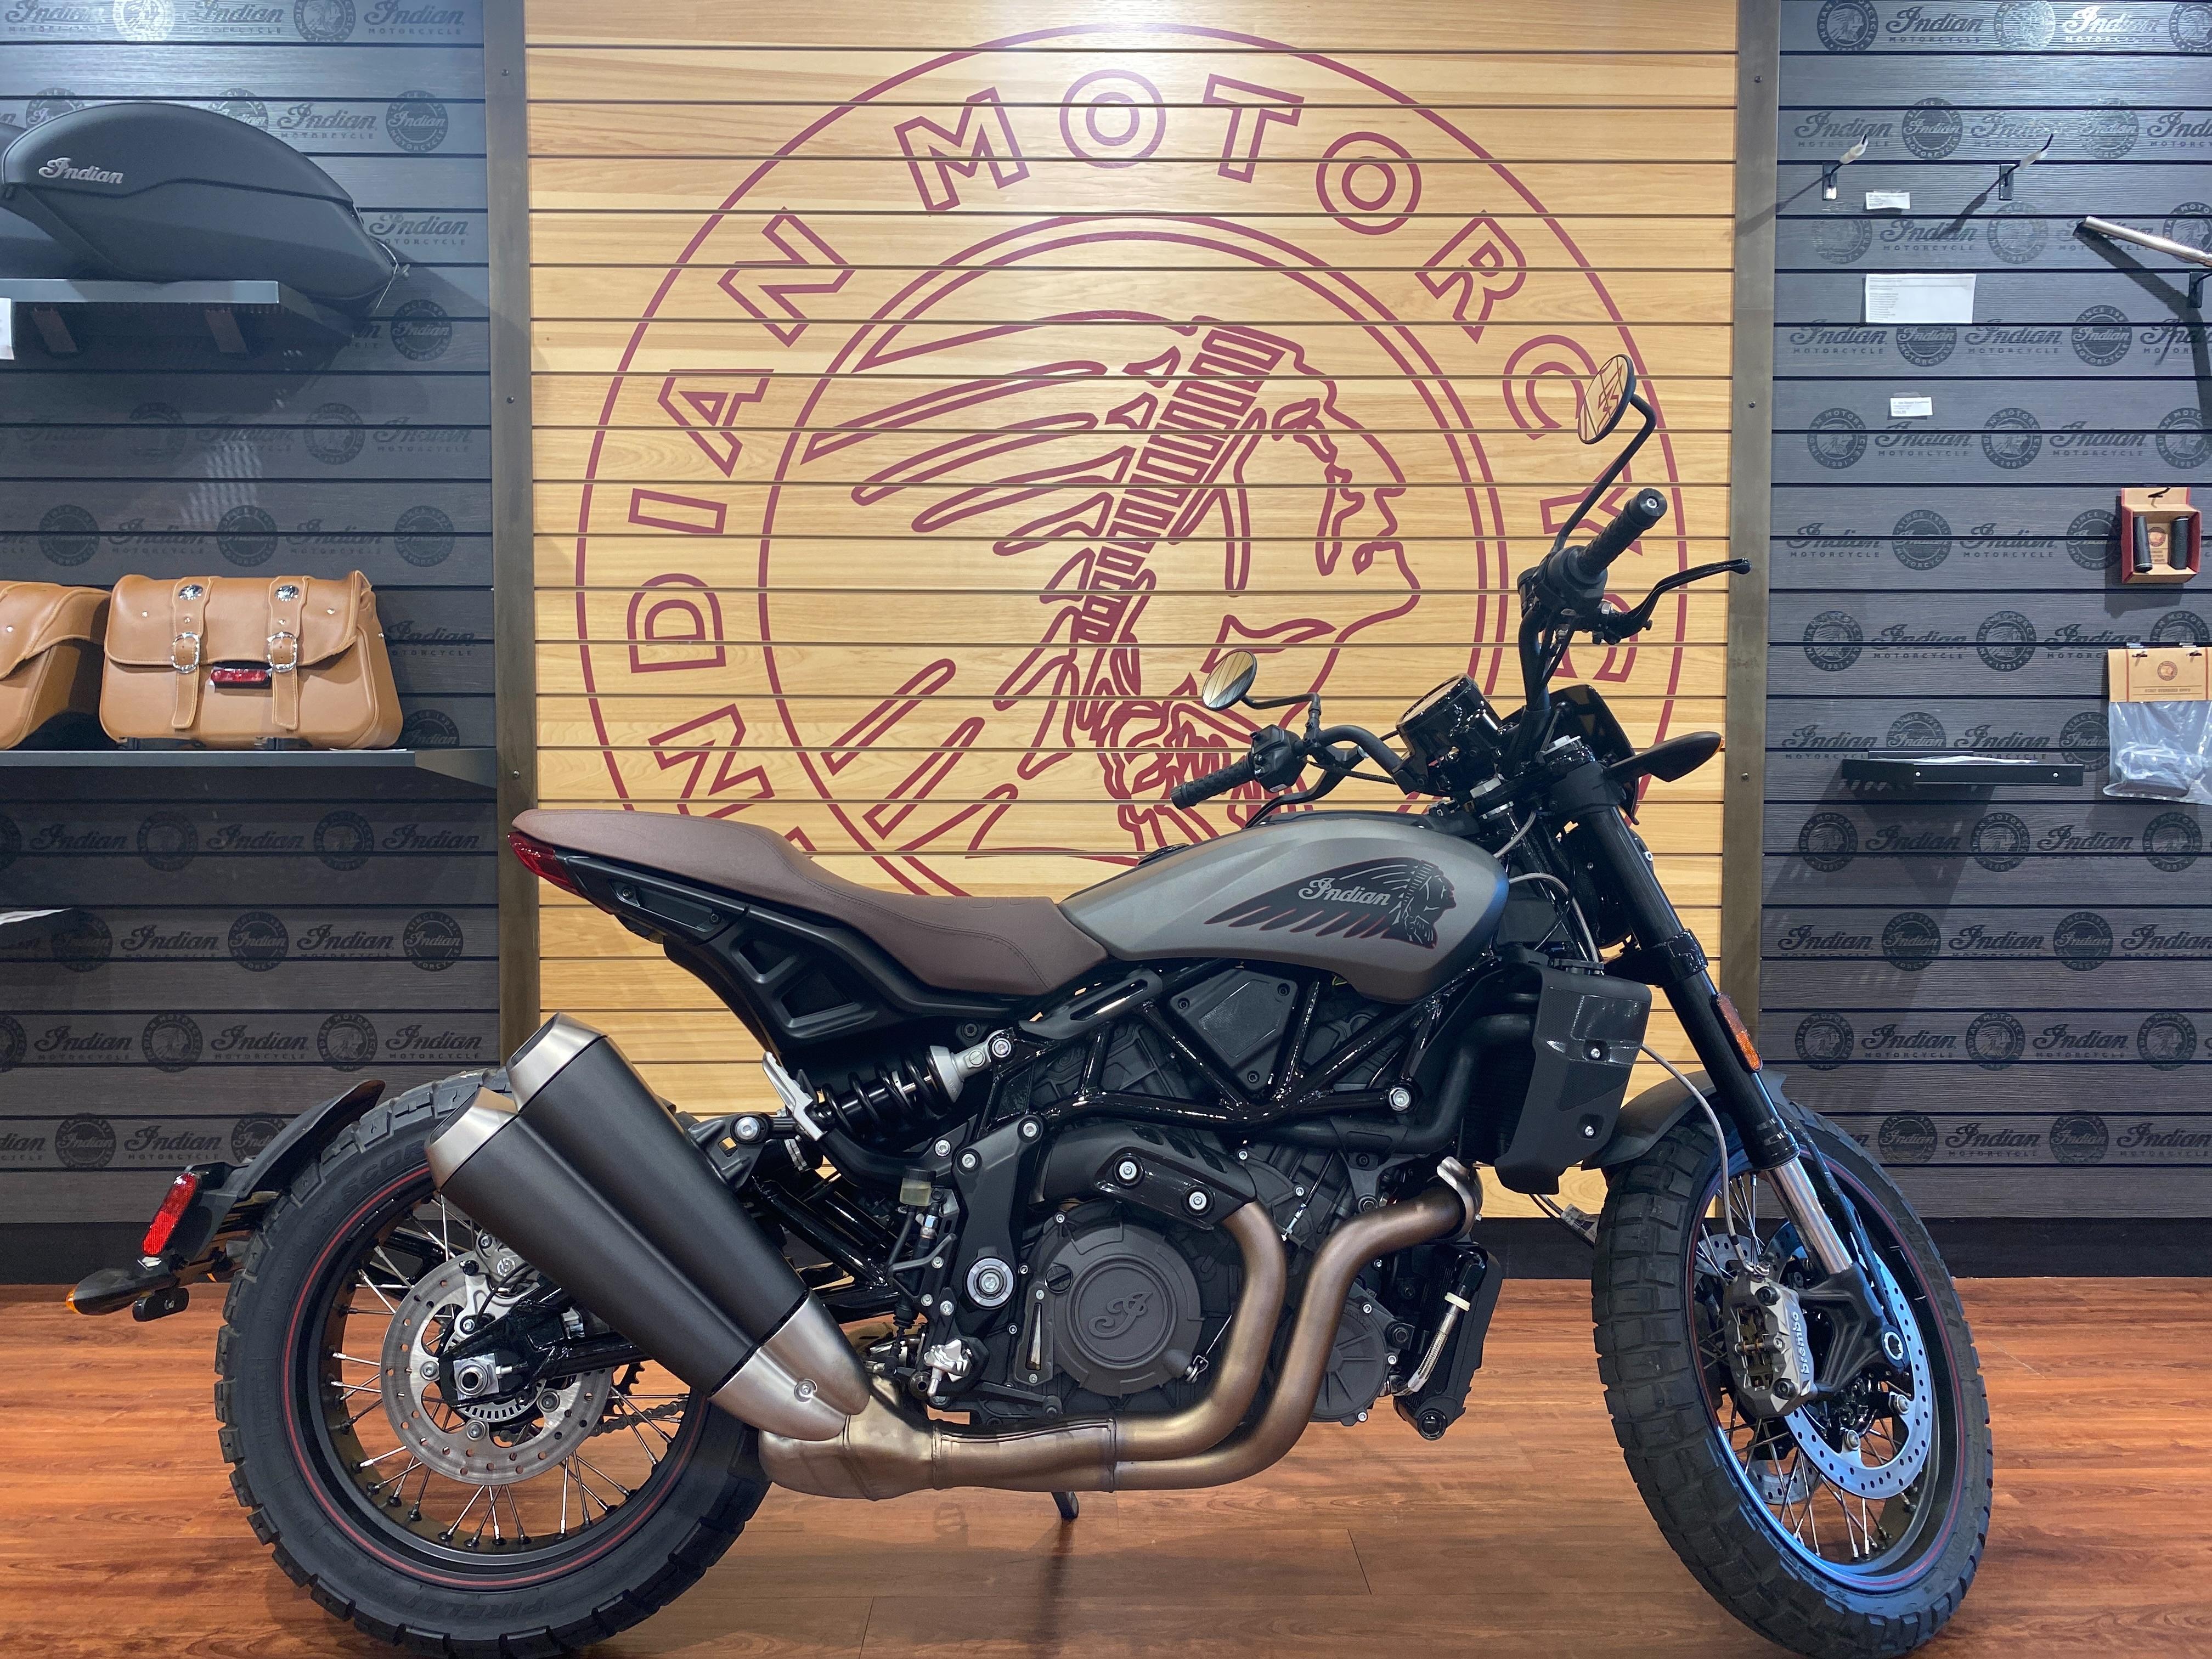 2022 Indian FTR Rally at Sloans Motorcycle ATV, Murfreesboro, TN, 37129